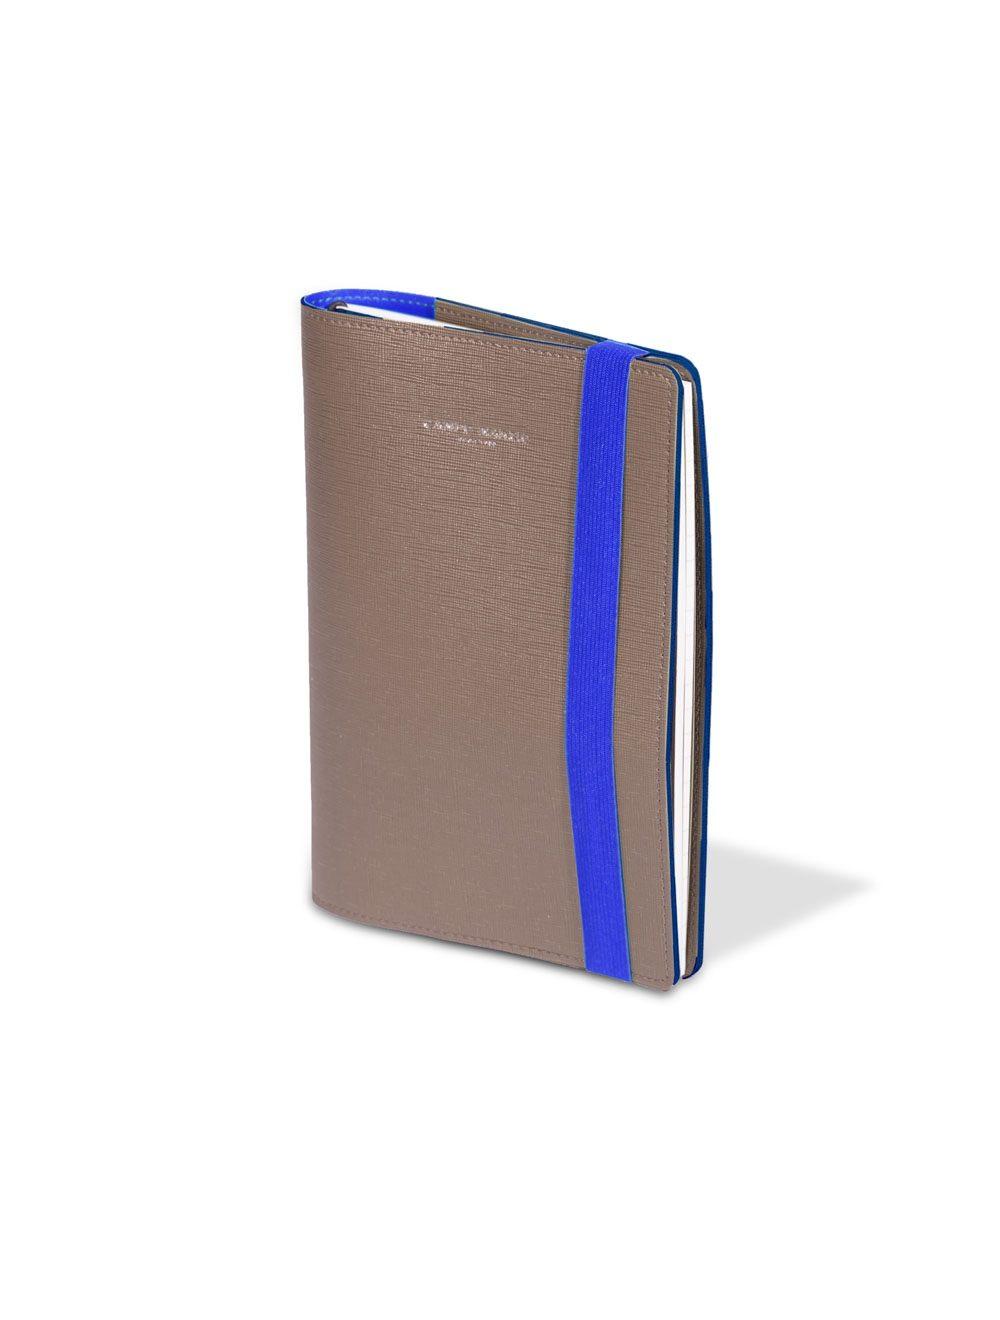 Charlton Journal - Taupe